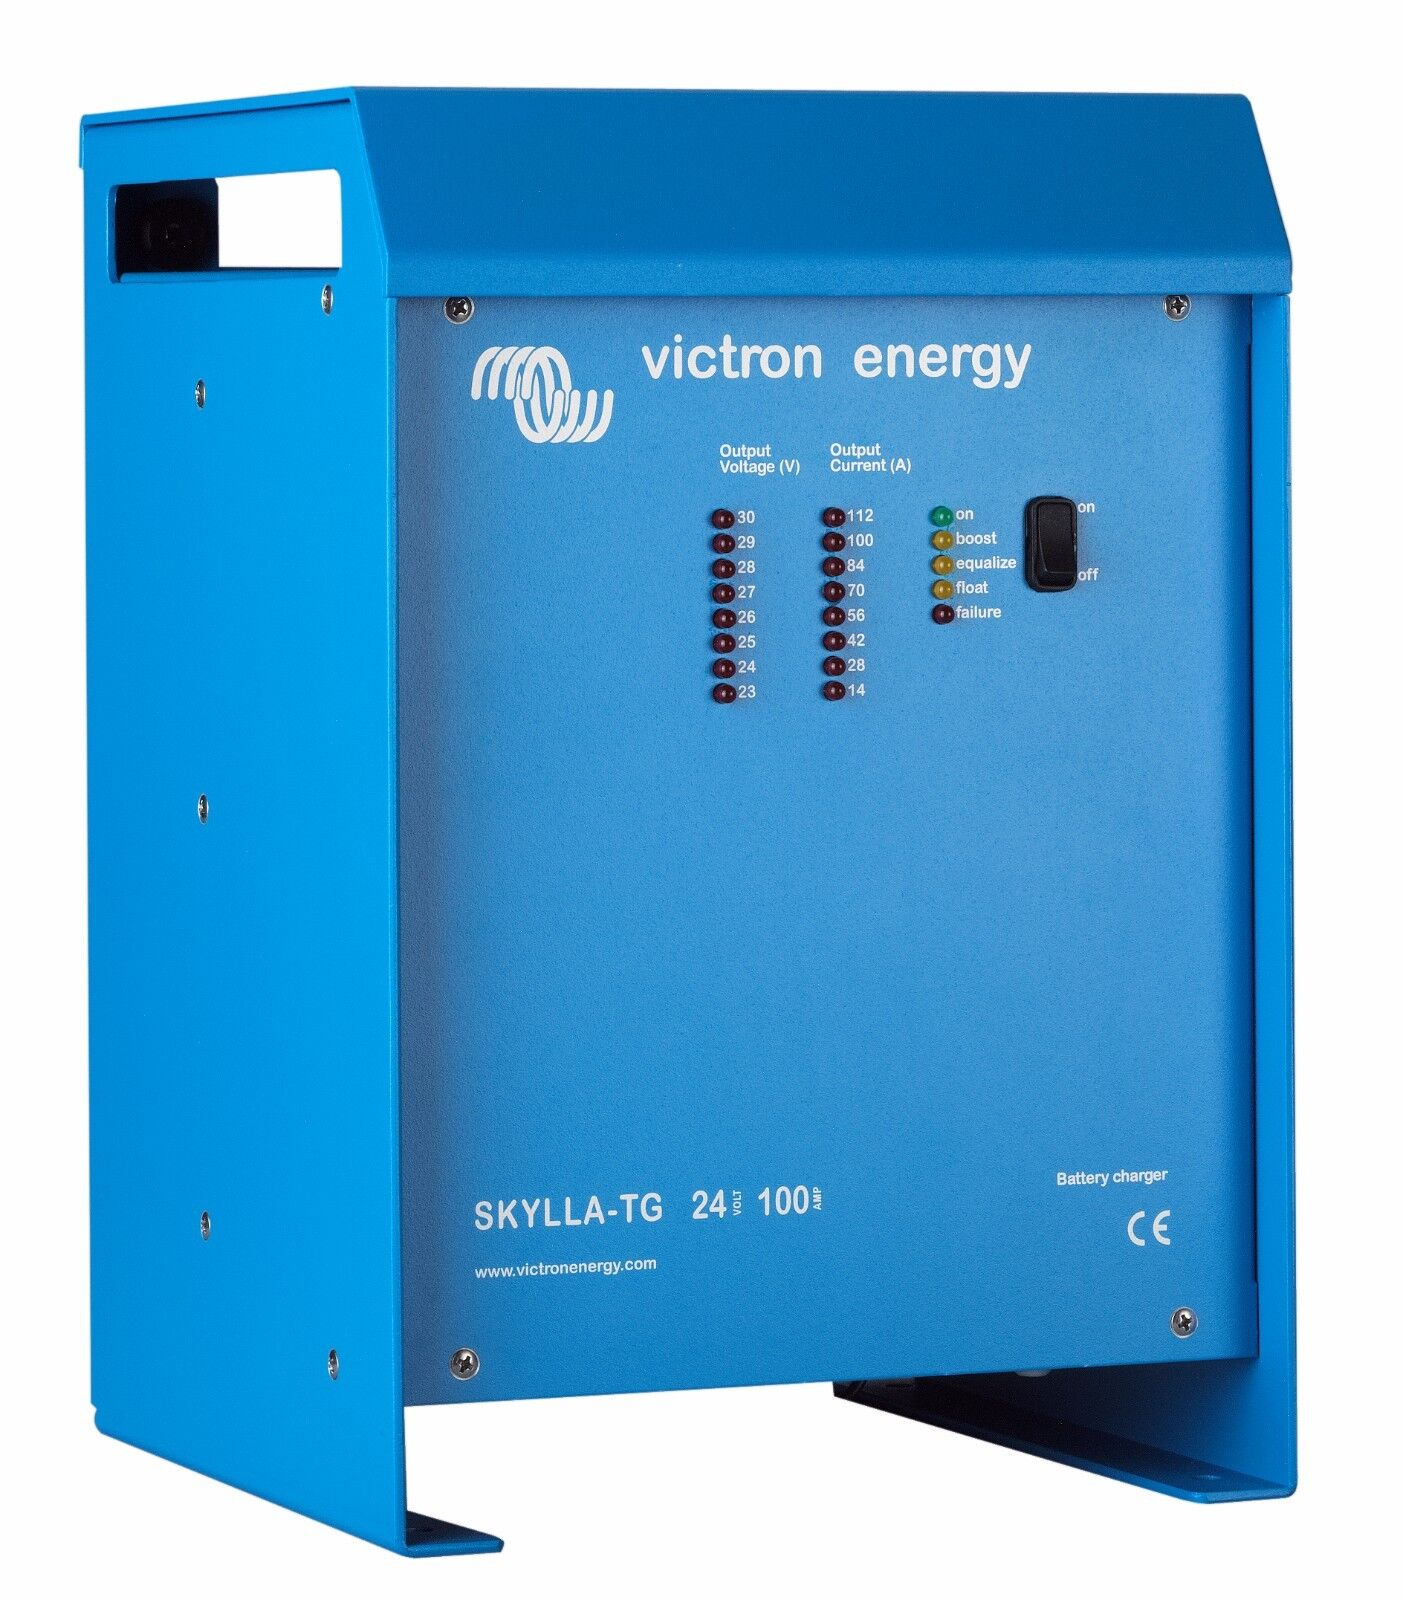 VICTRON ENERGY SKYLLA-TG 24/30(1+1) 230V **FREE SHIPPING** **5 YEAR WARRANTY**